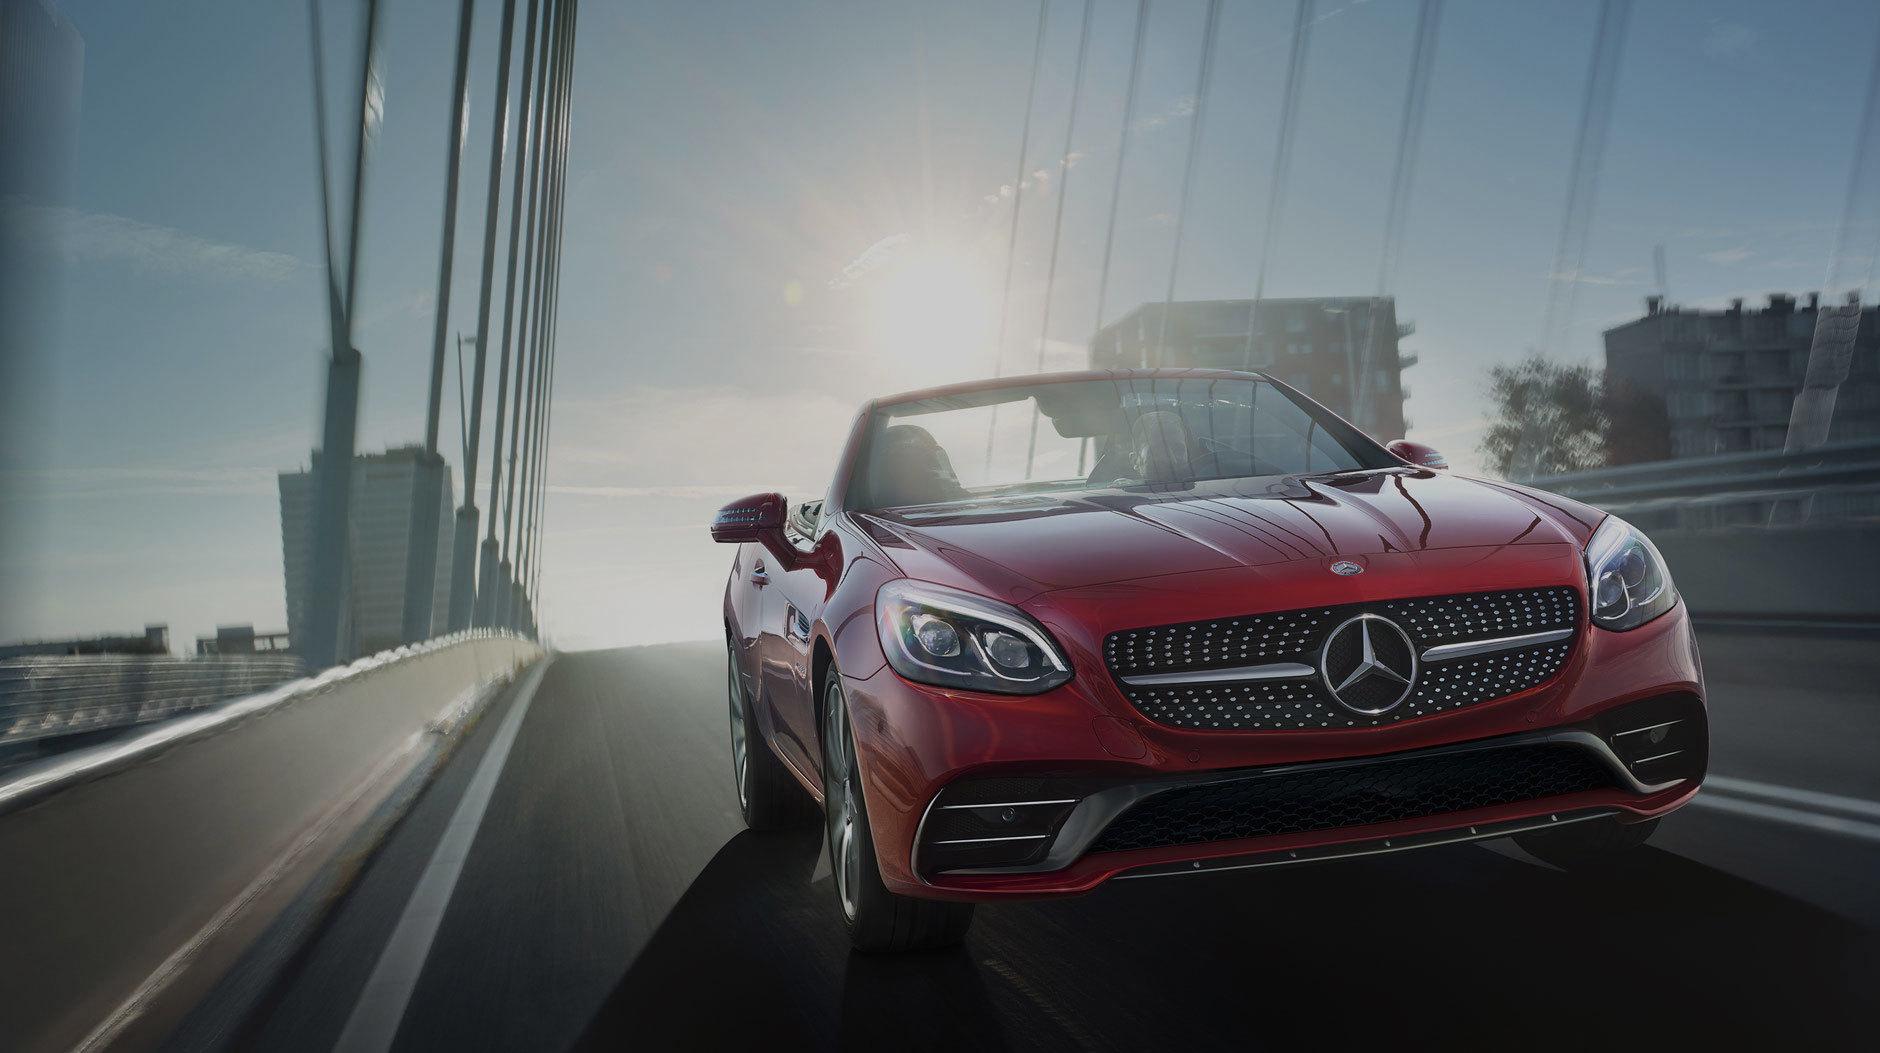 Buy line New Mercedes Benz AMG SLC 43 Roadster in Walnut Creek